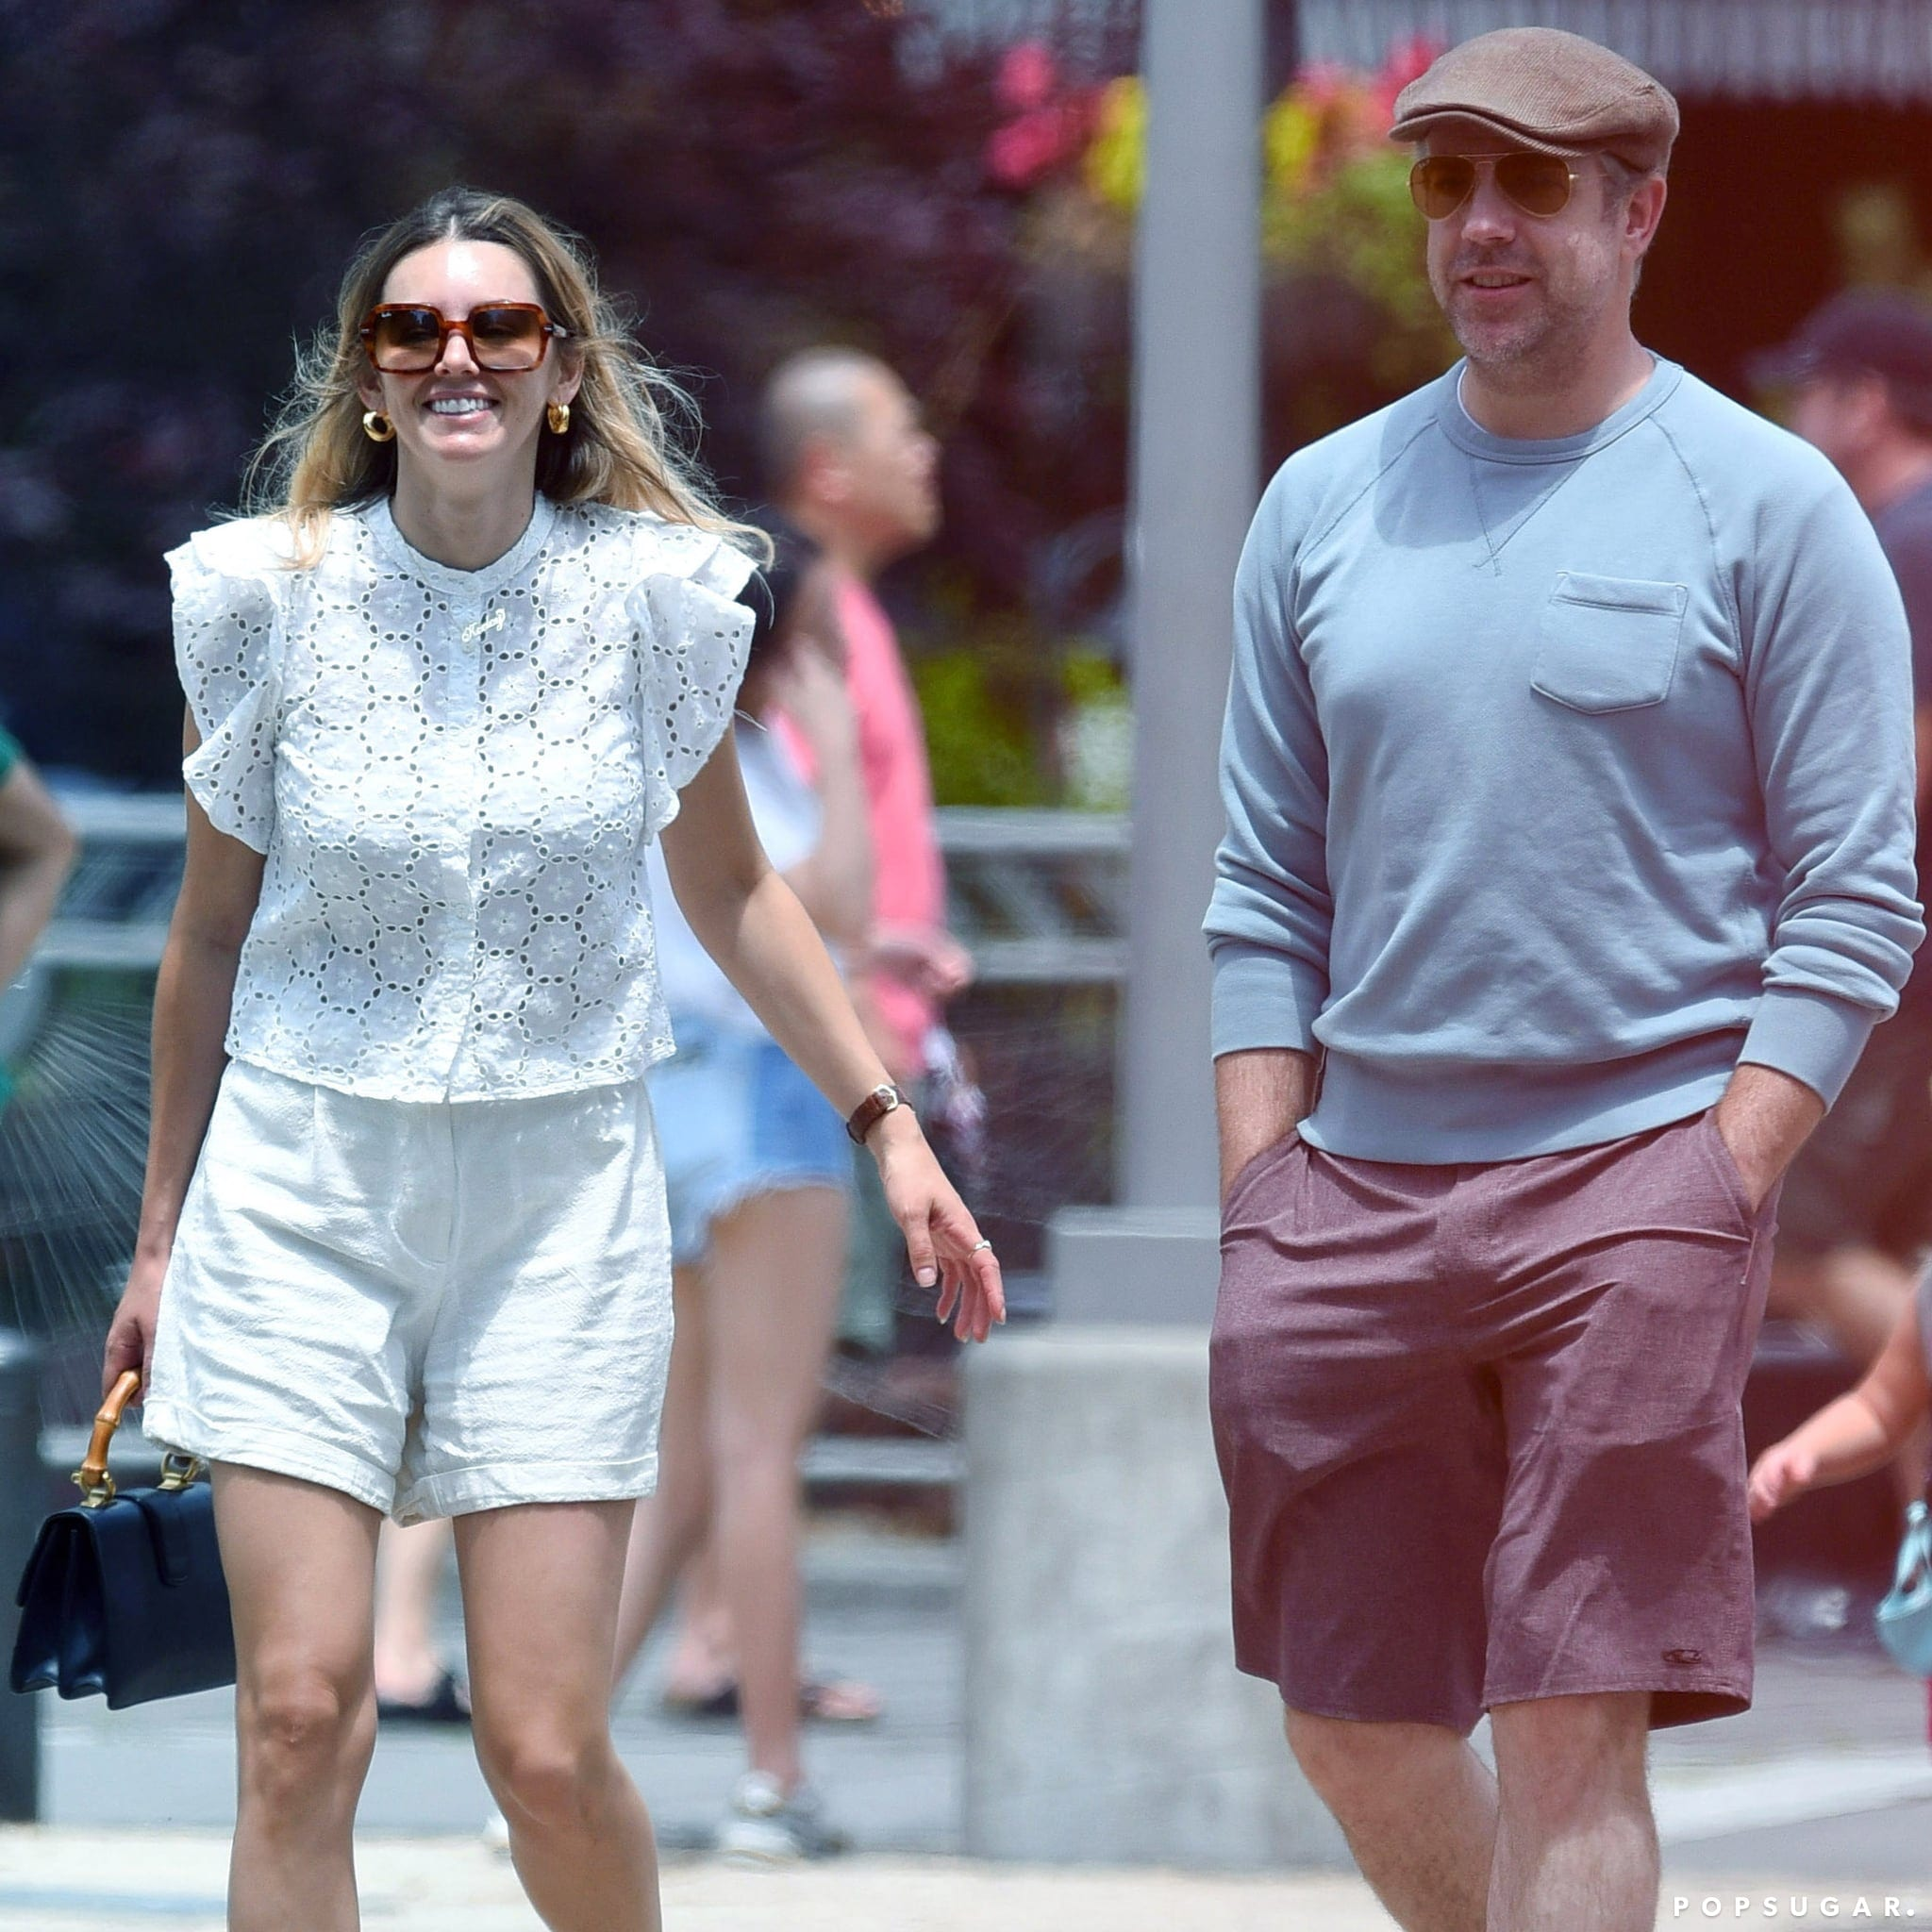 Jason Sudeikis and Keeley Hazell Dating?